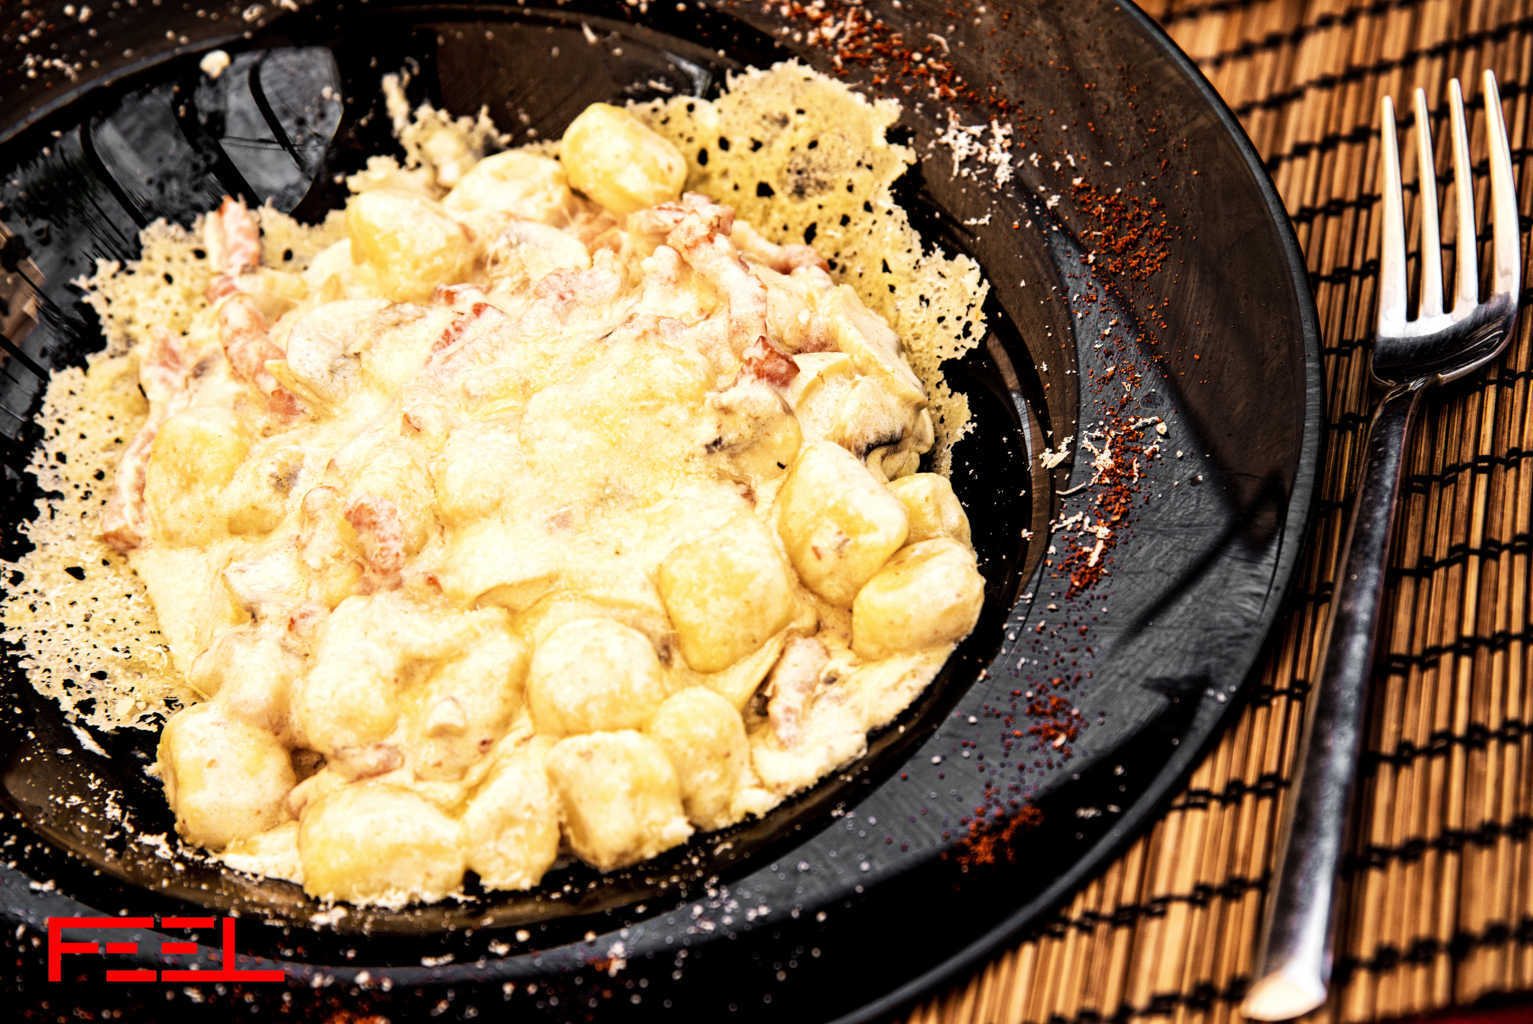 feel restaurant ibiza gnocchi con gorgonzola